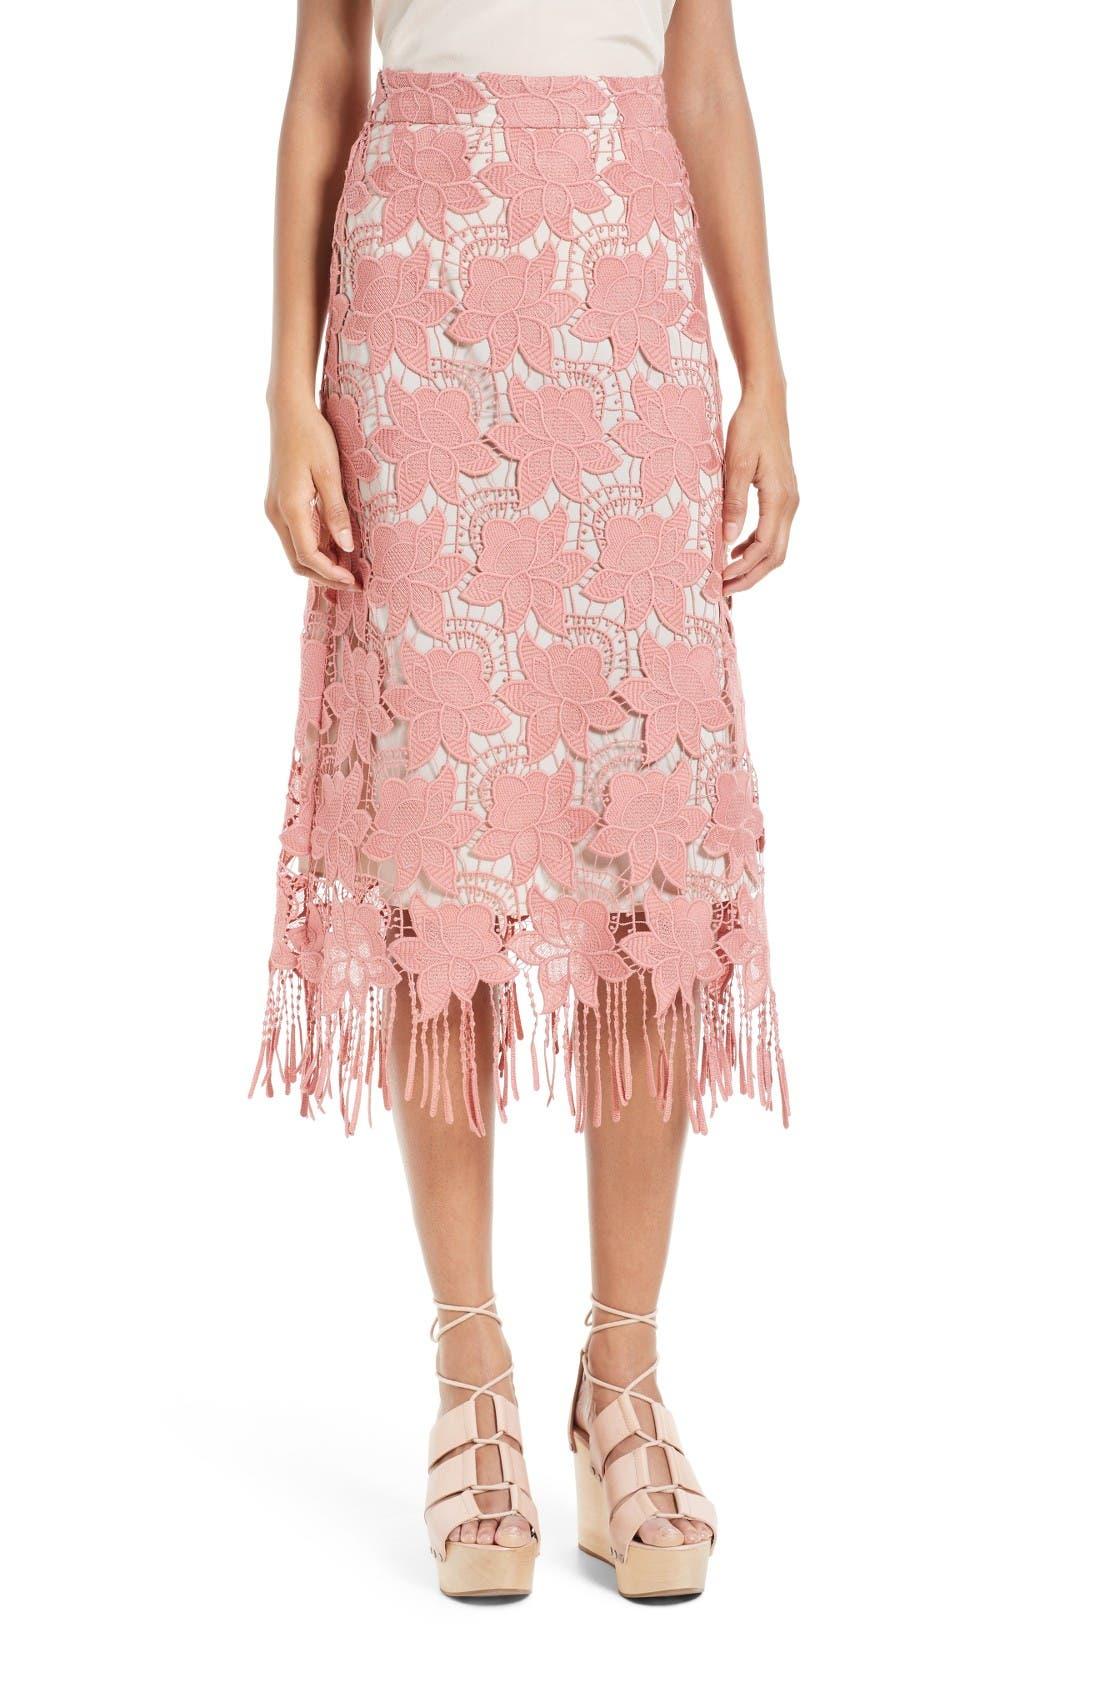 Alternate Image 1 Selected - Alice + Olivia Strand Lace Pencil Skirt